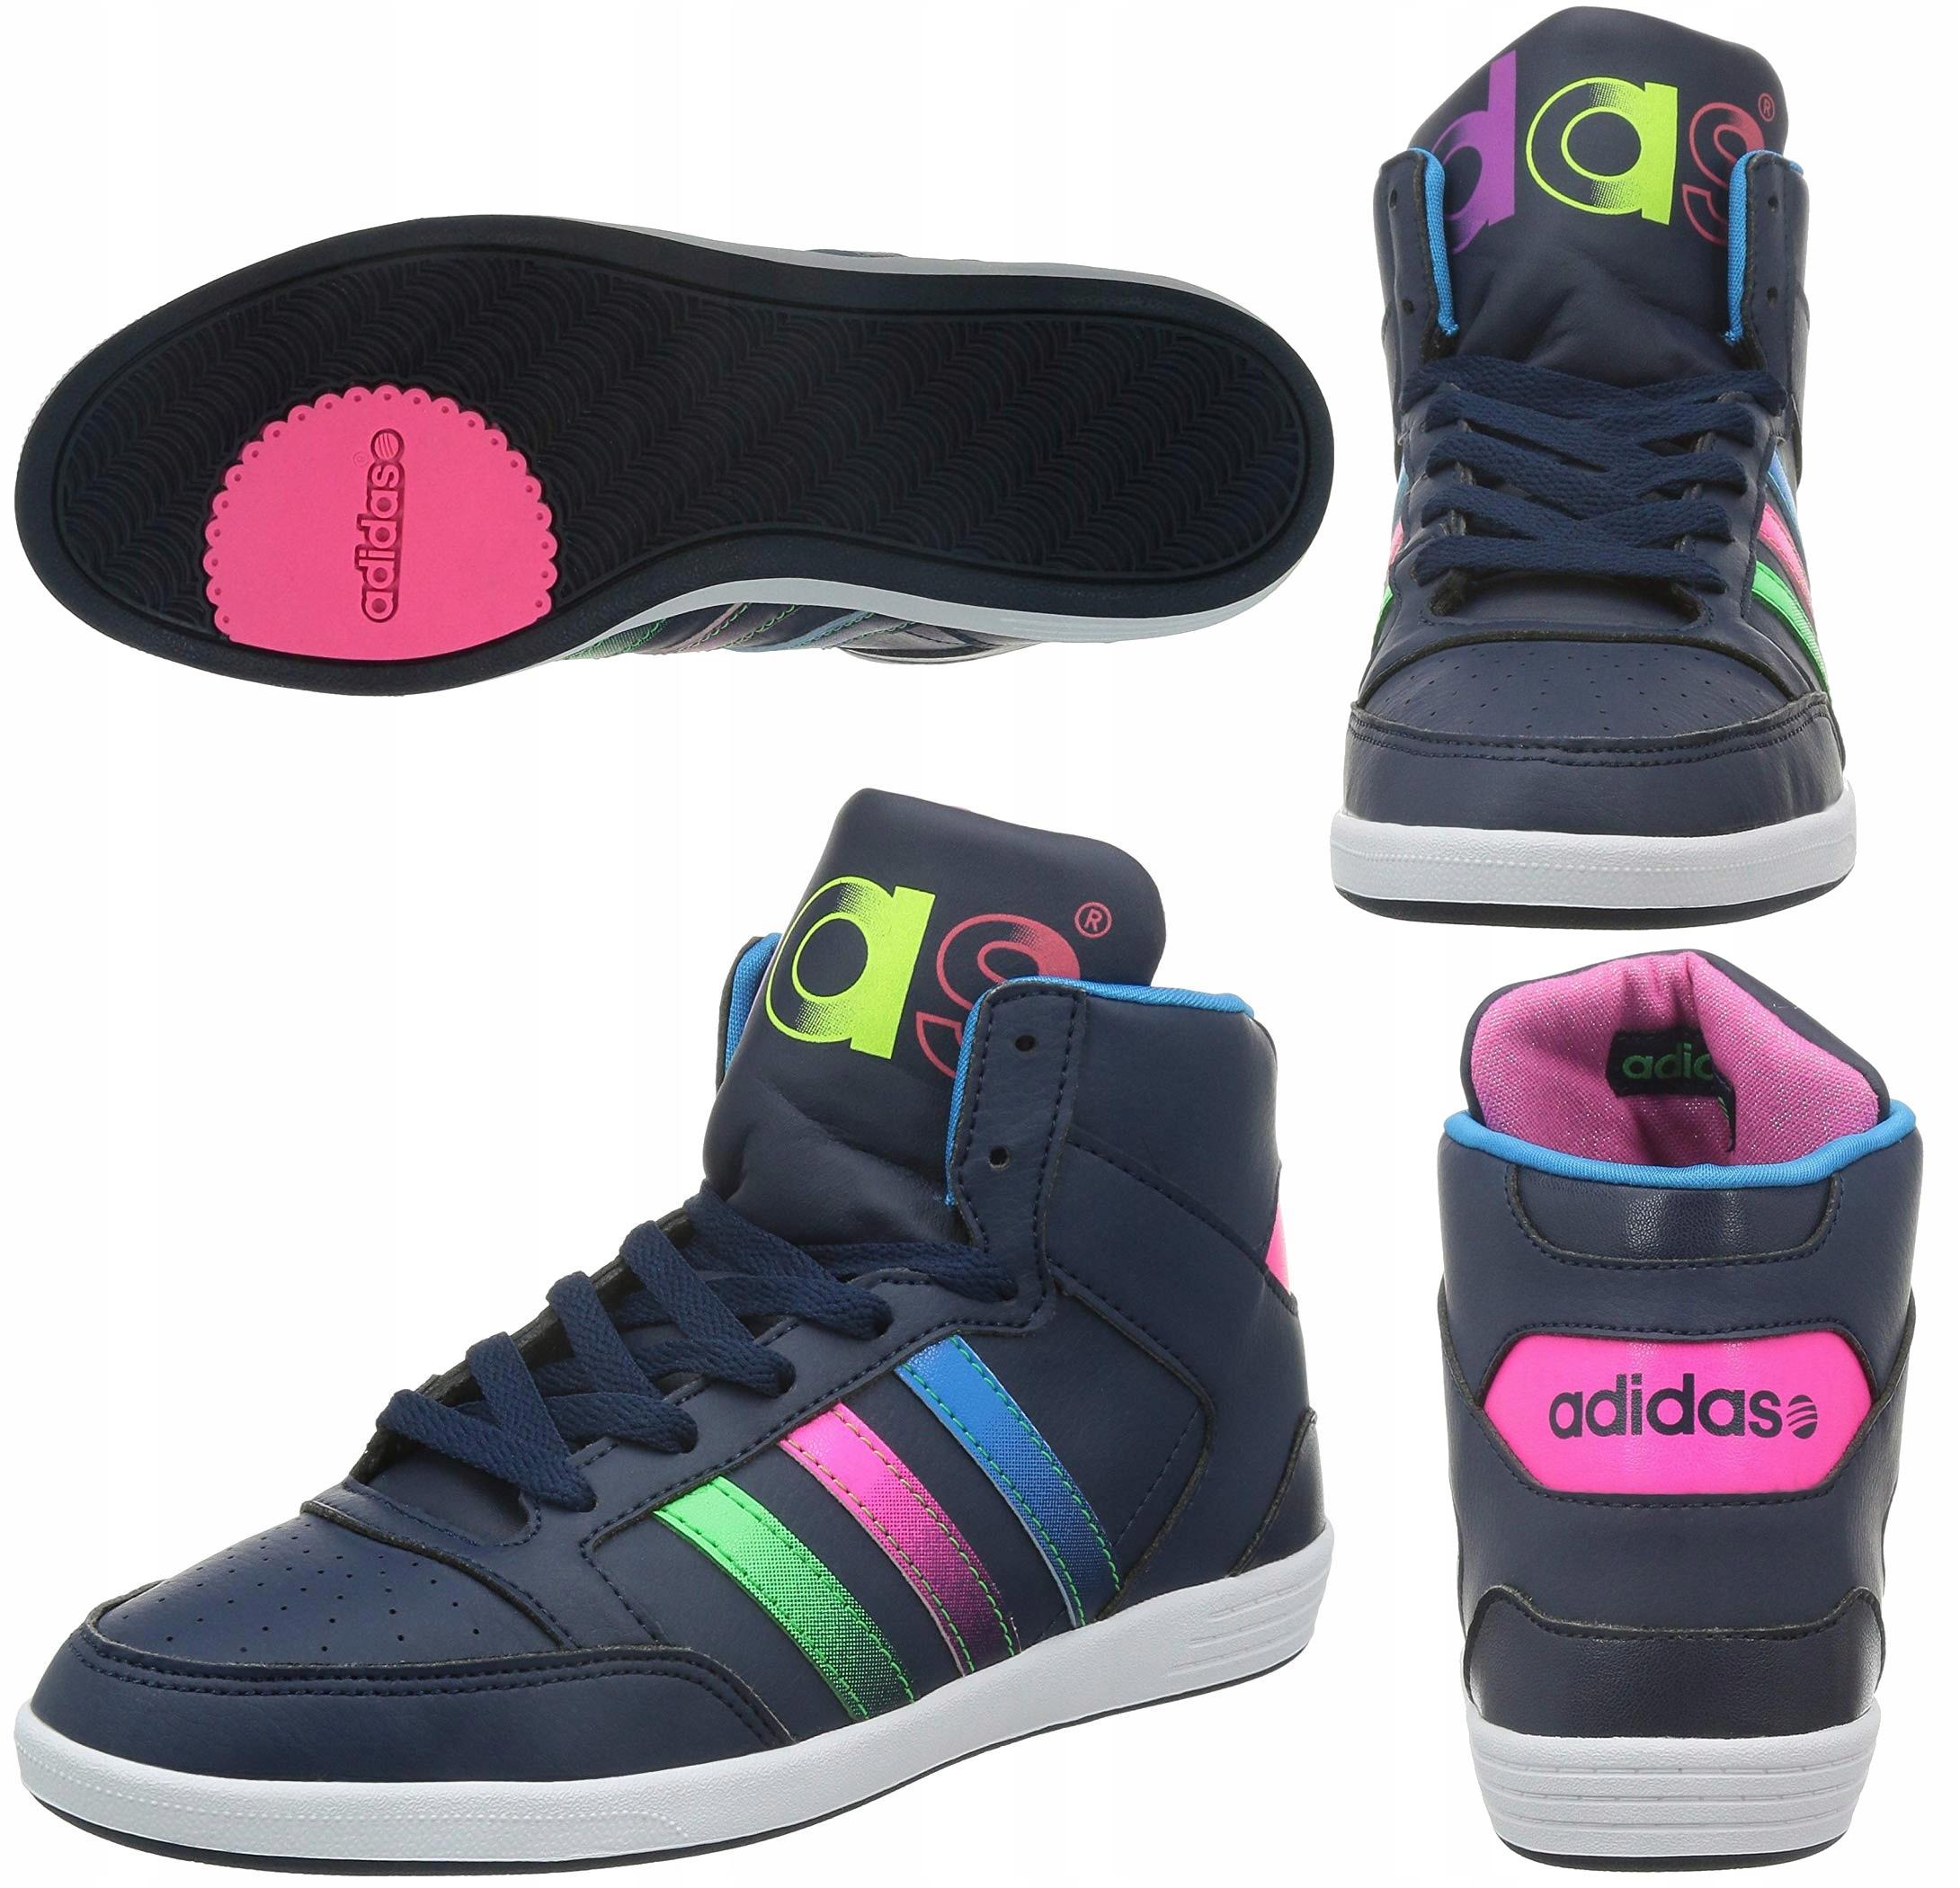 Adidas Hoops Street buty damskie sportowe 39 13